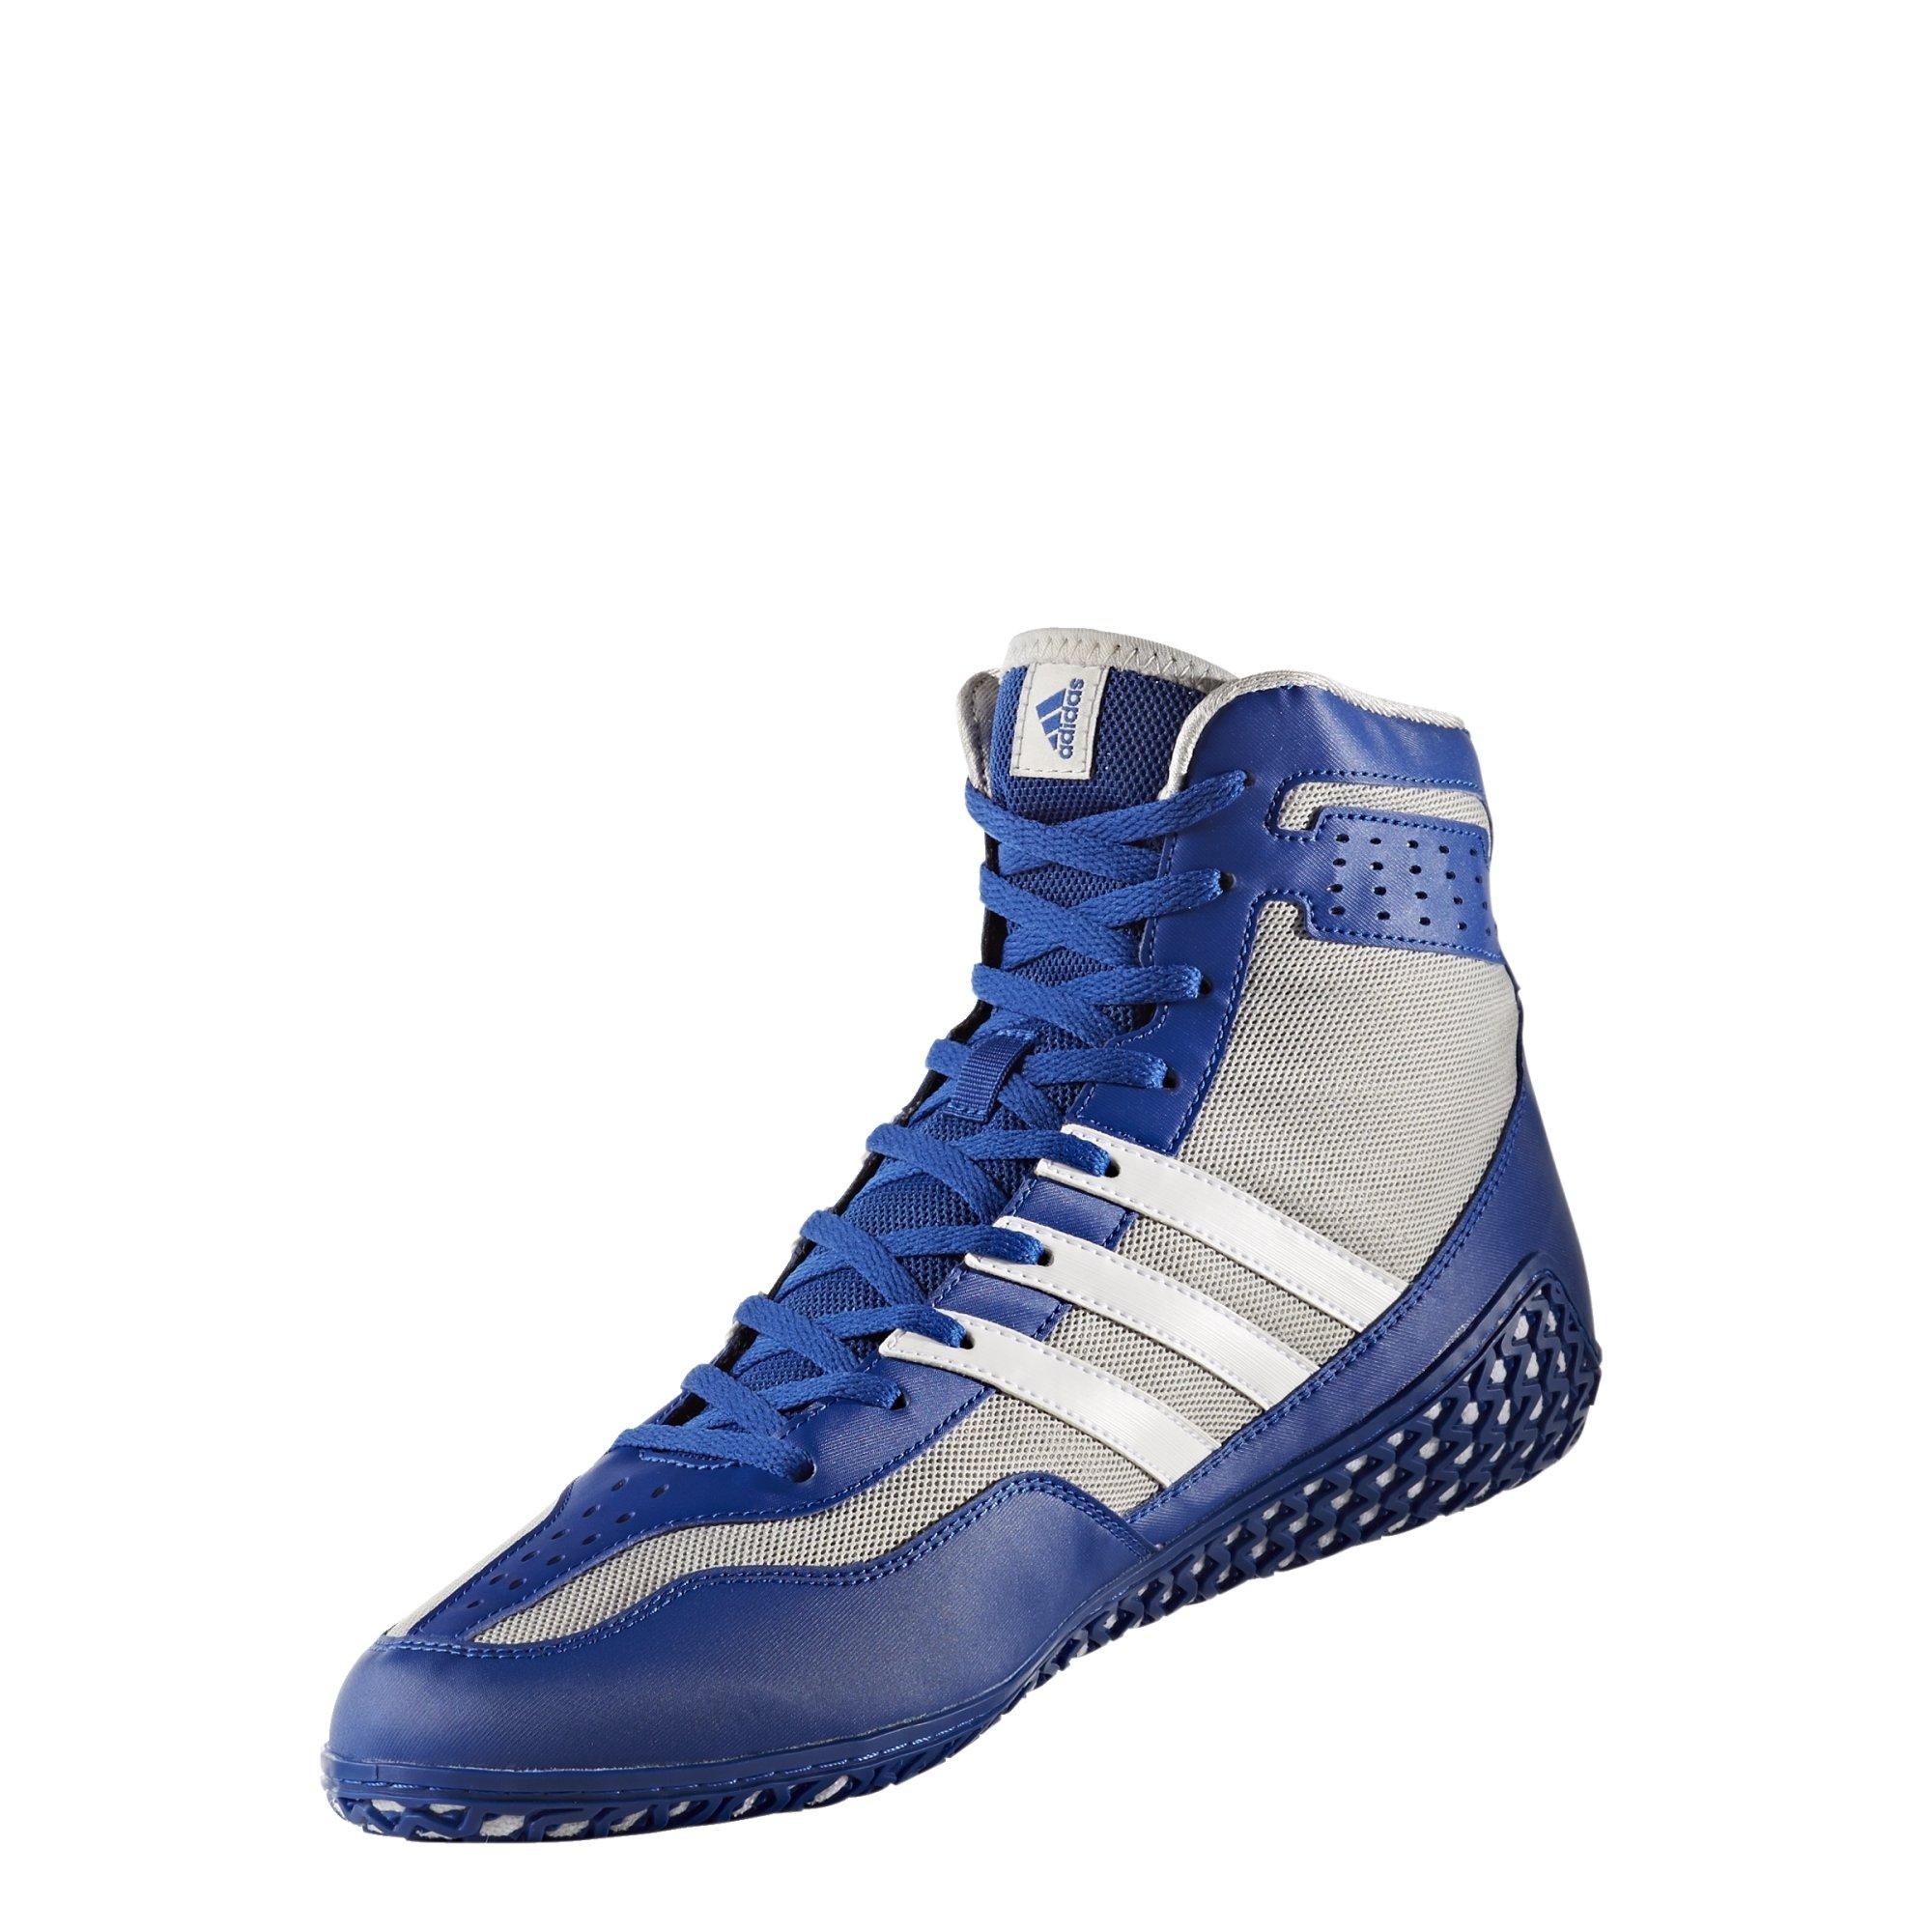 adidas Mat Wizard Men's Wrestling Shoes, Royal/White/Grey, Size 13